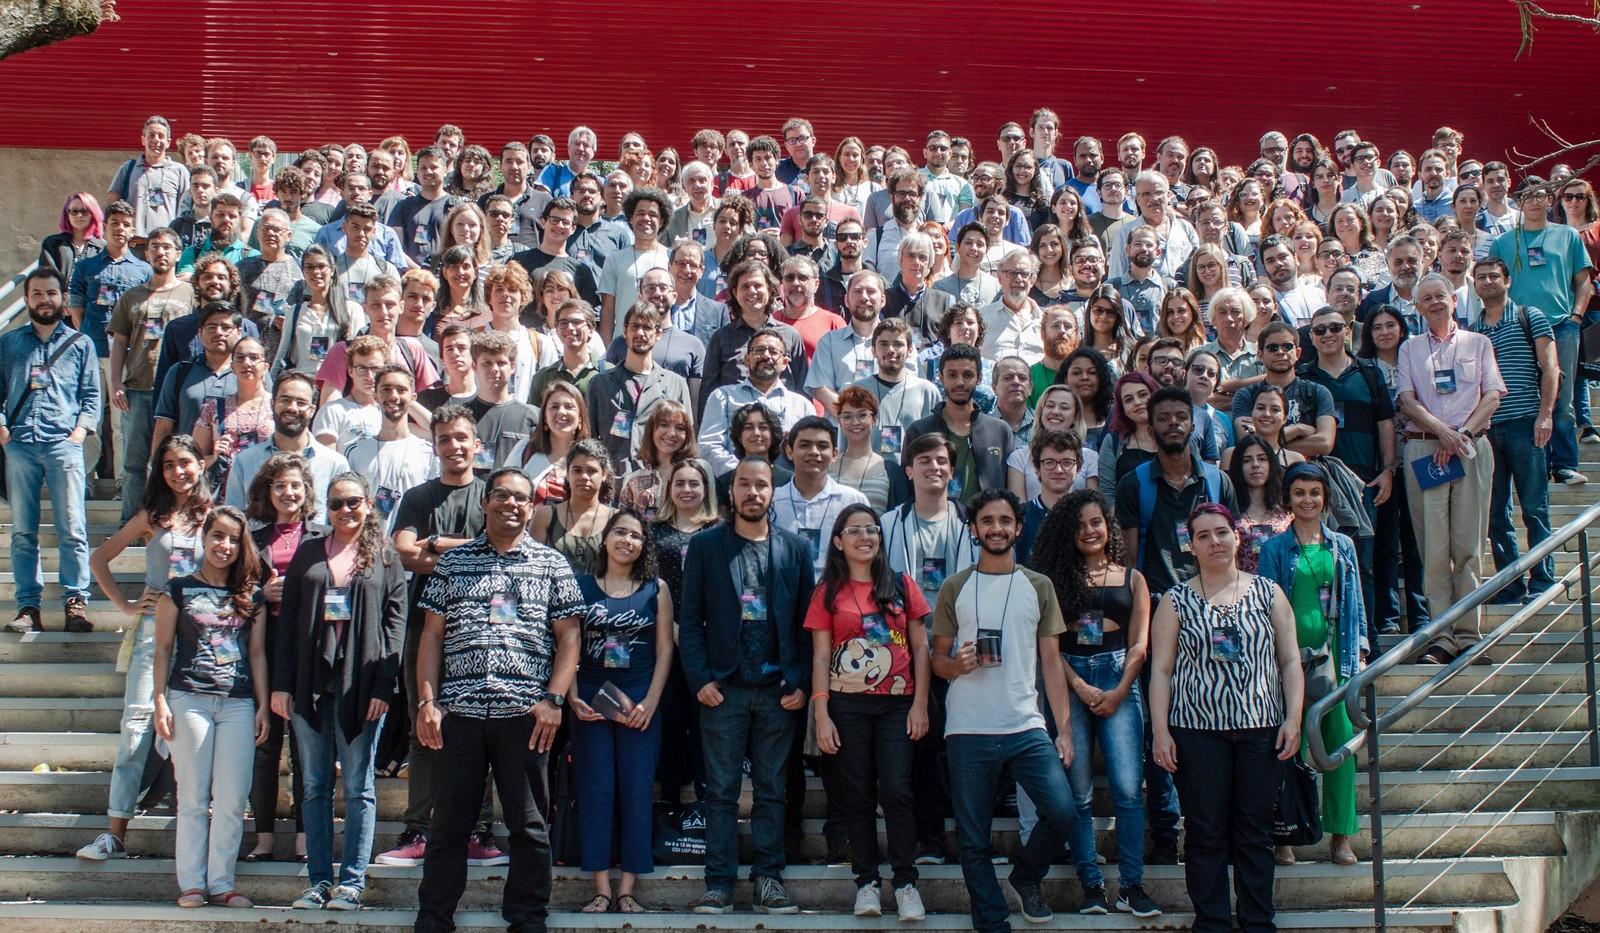 XLIII Anual Meeting of the Brazilian Astronomical Society (SAB), 2019